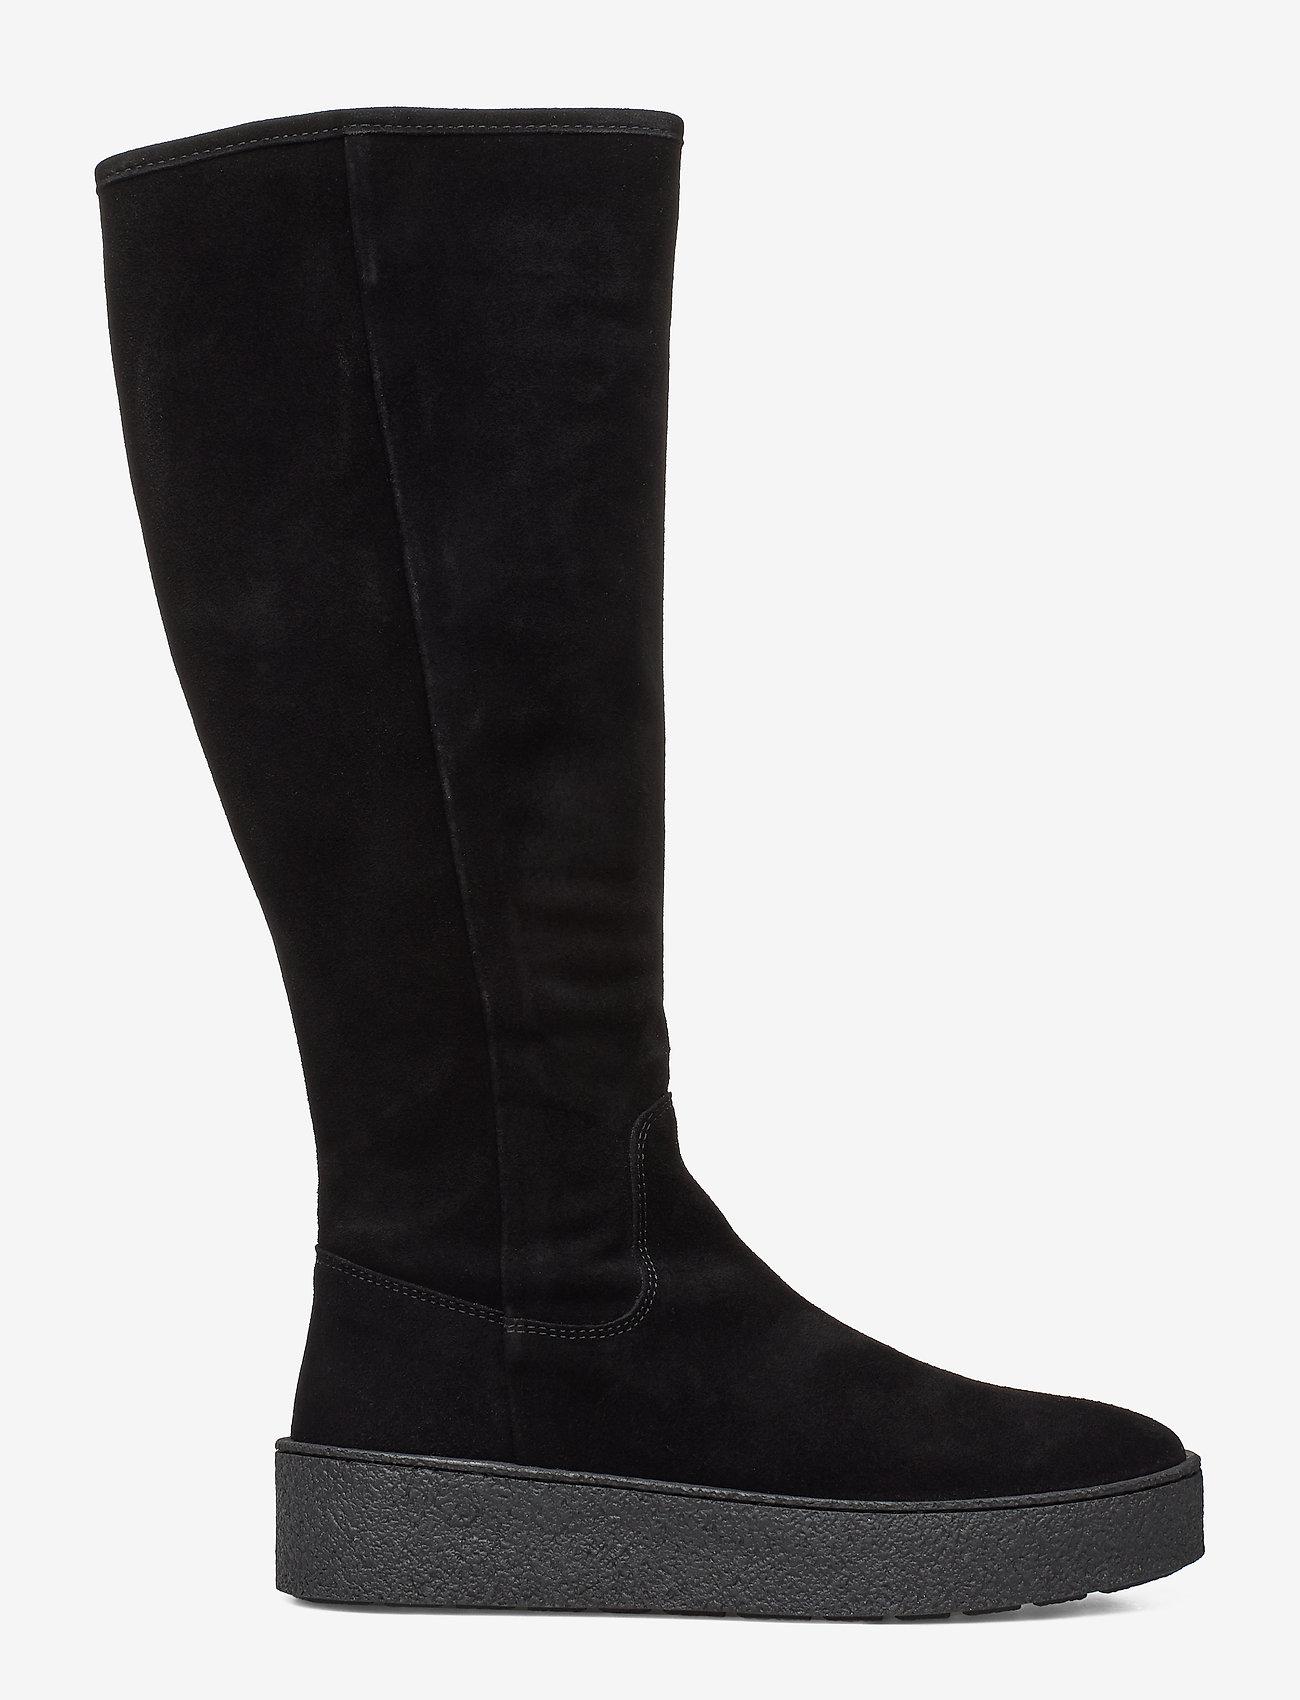 Billi Bi - Warm lining 3604 - pitkävartiset saappaat - black suede 503/silver 503